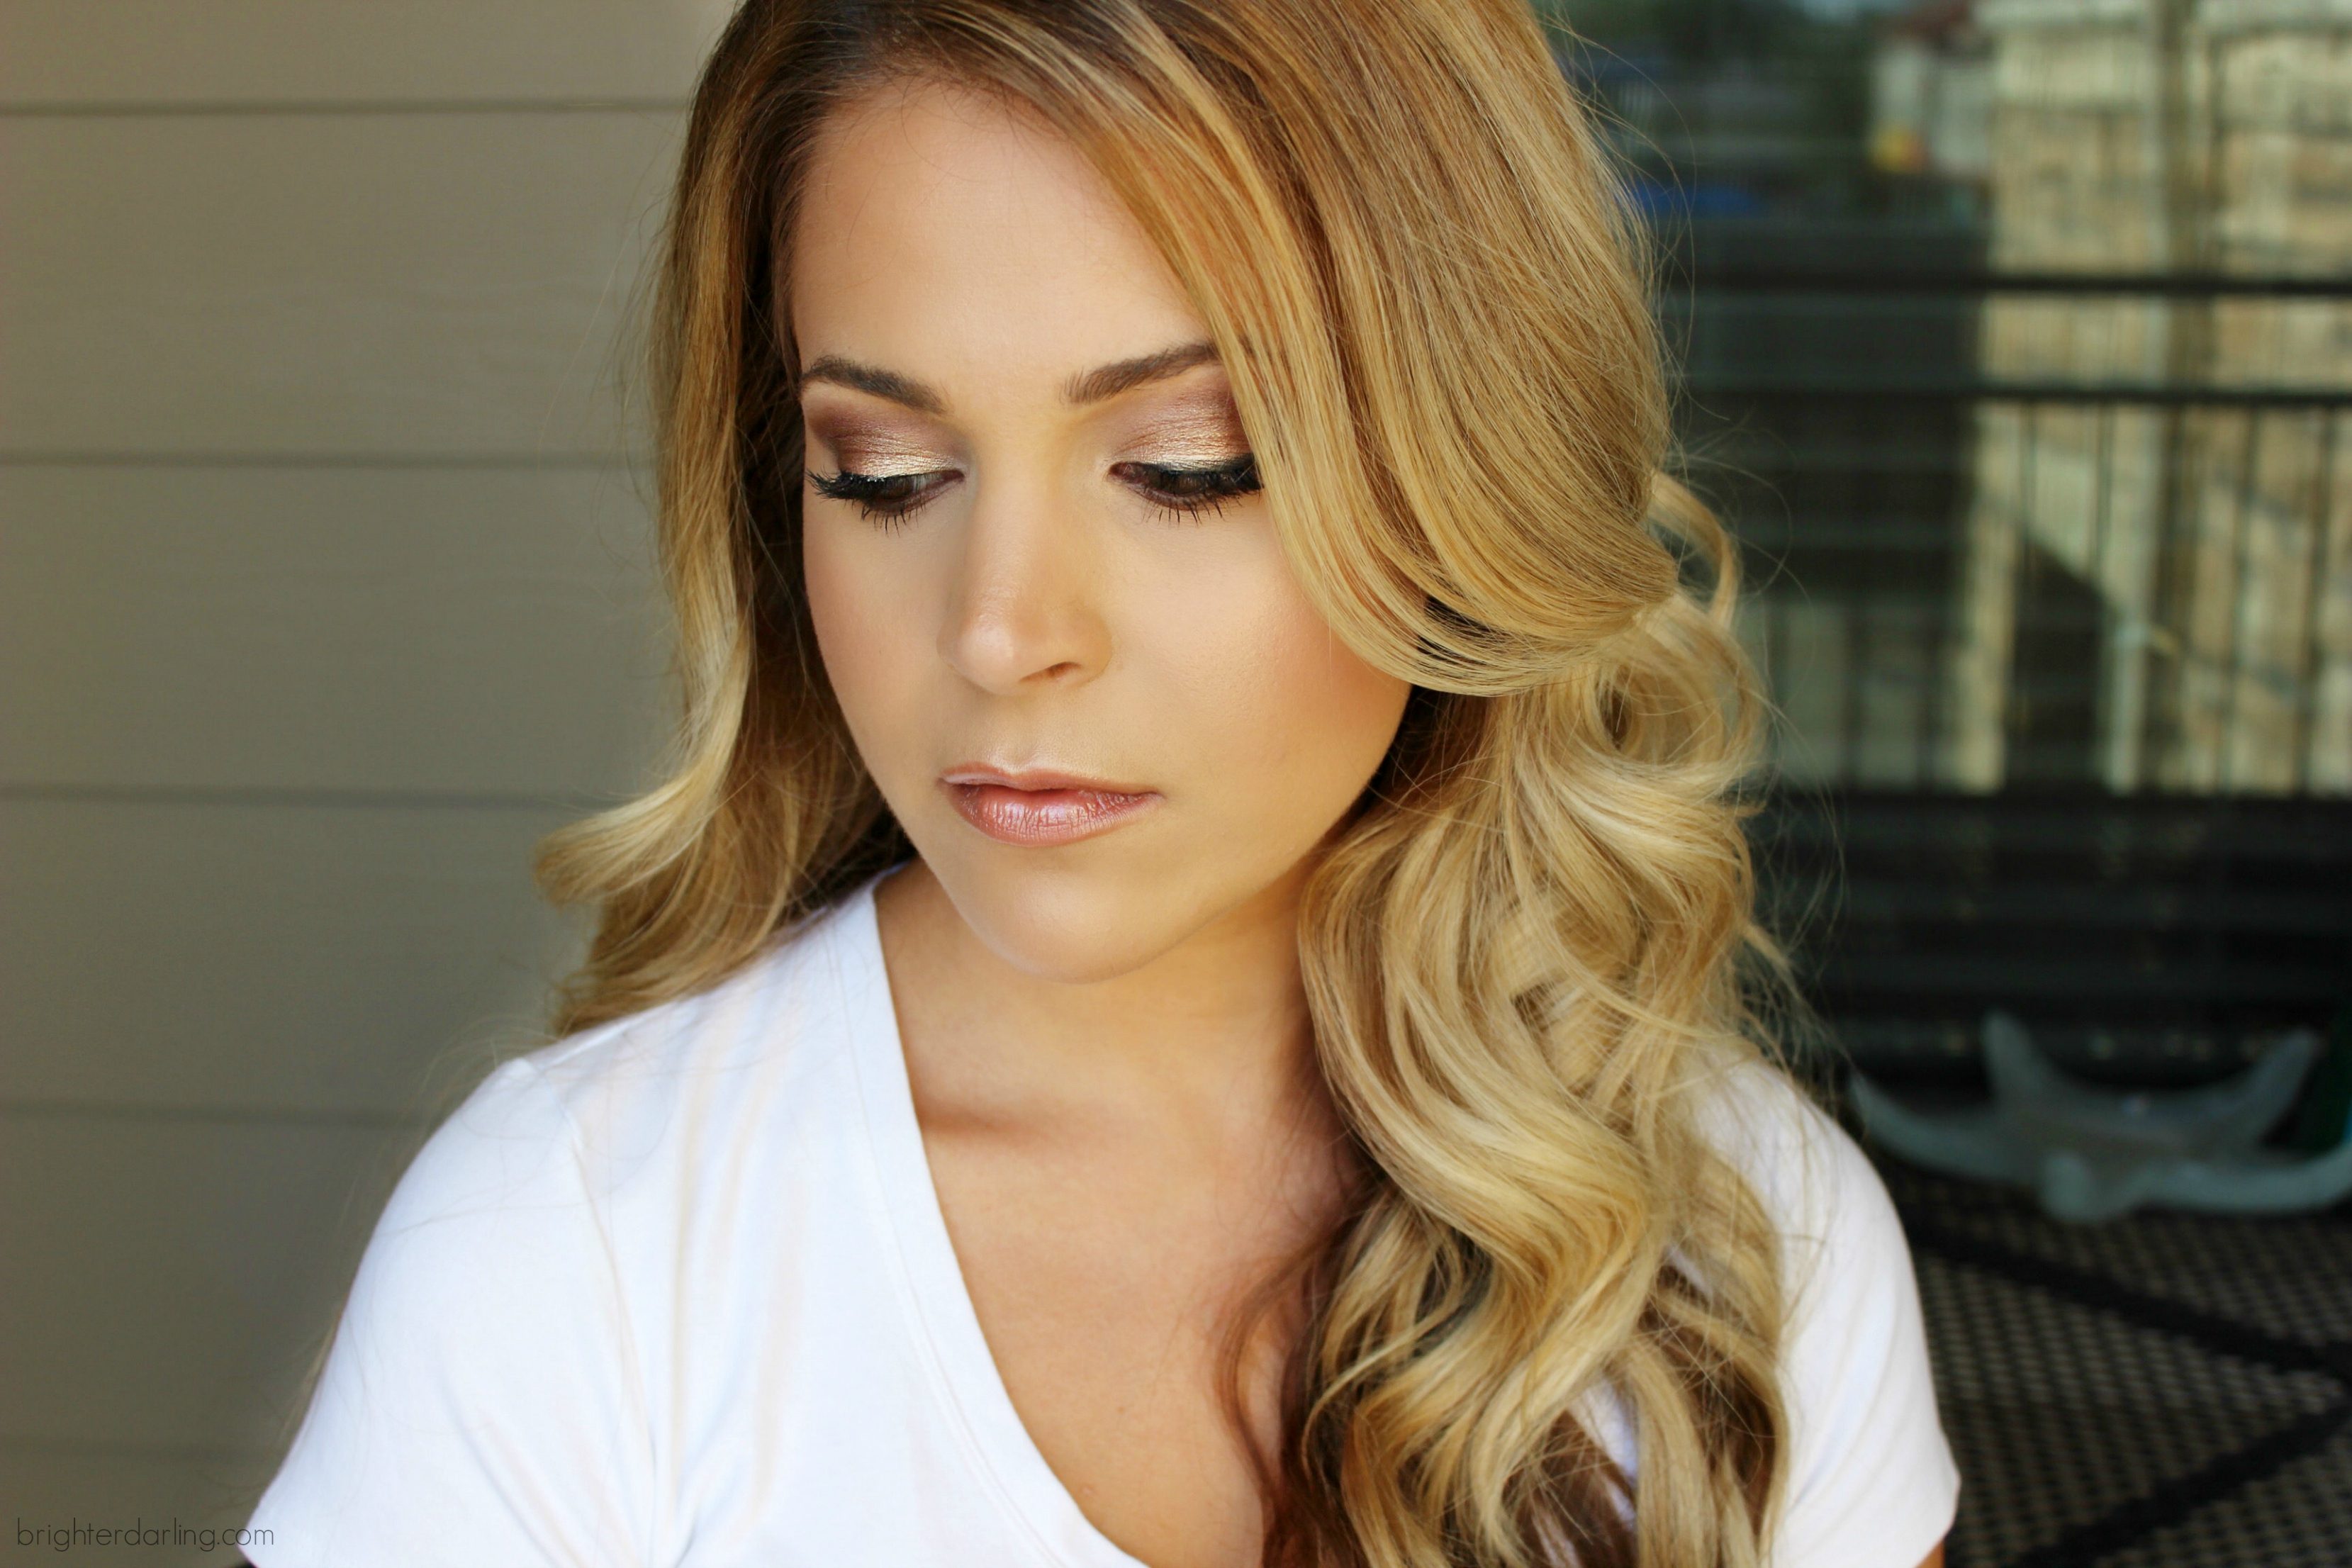 BrighterDarling.com Fall Bronze Glow Makeup